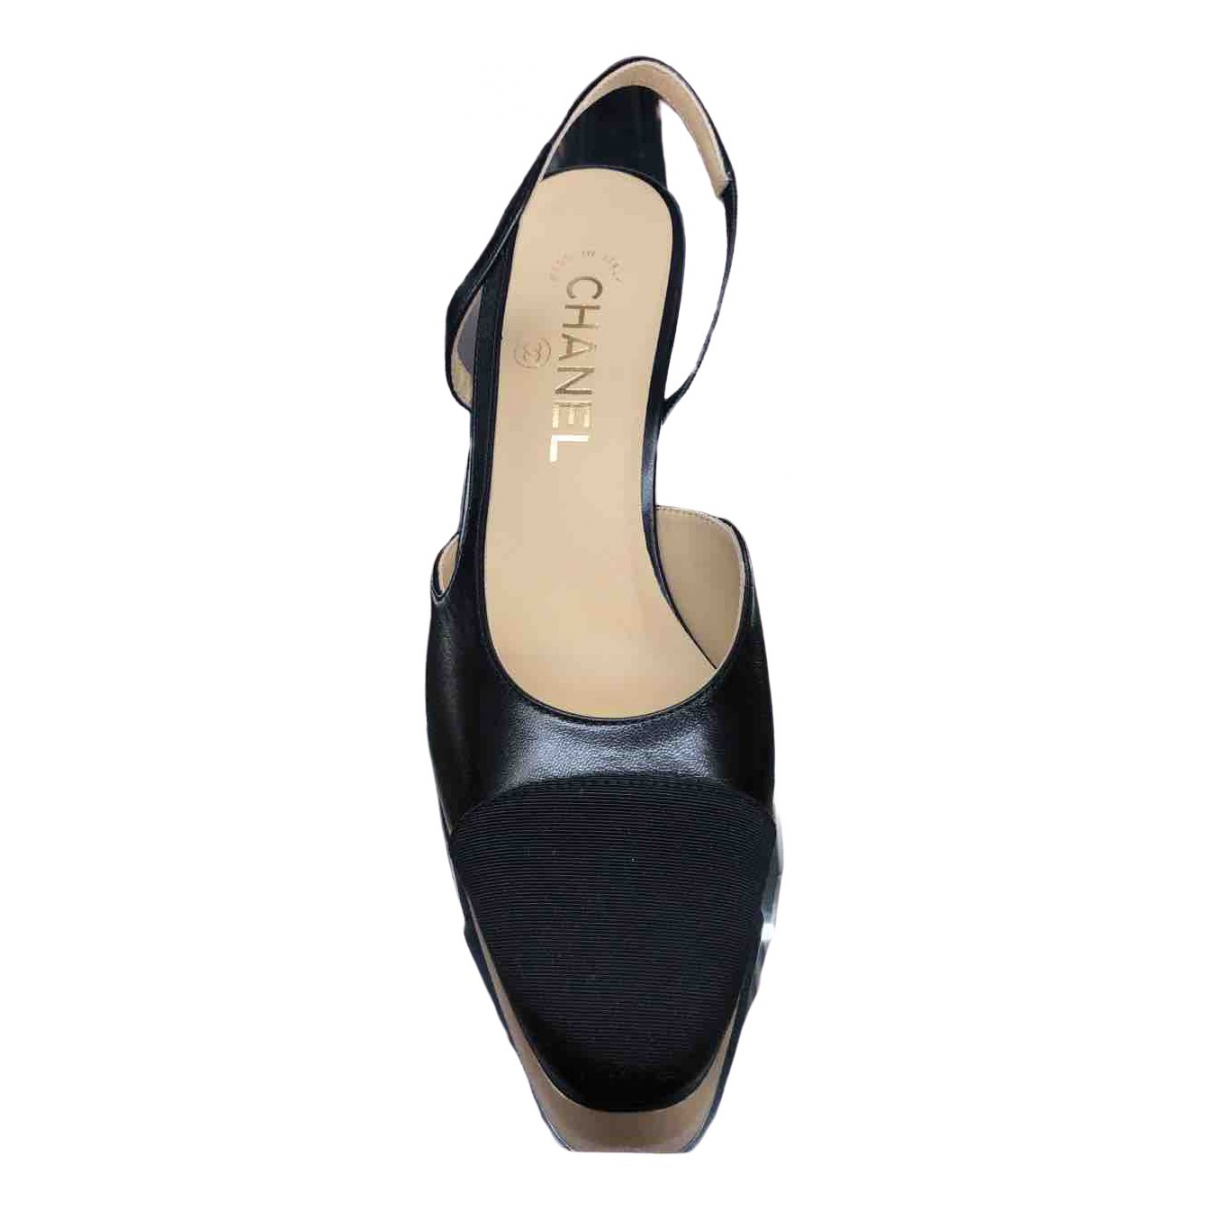 Chanel Slingback Black Leather Heels for Women 38 EU